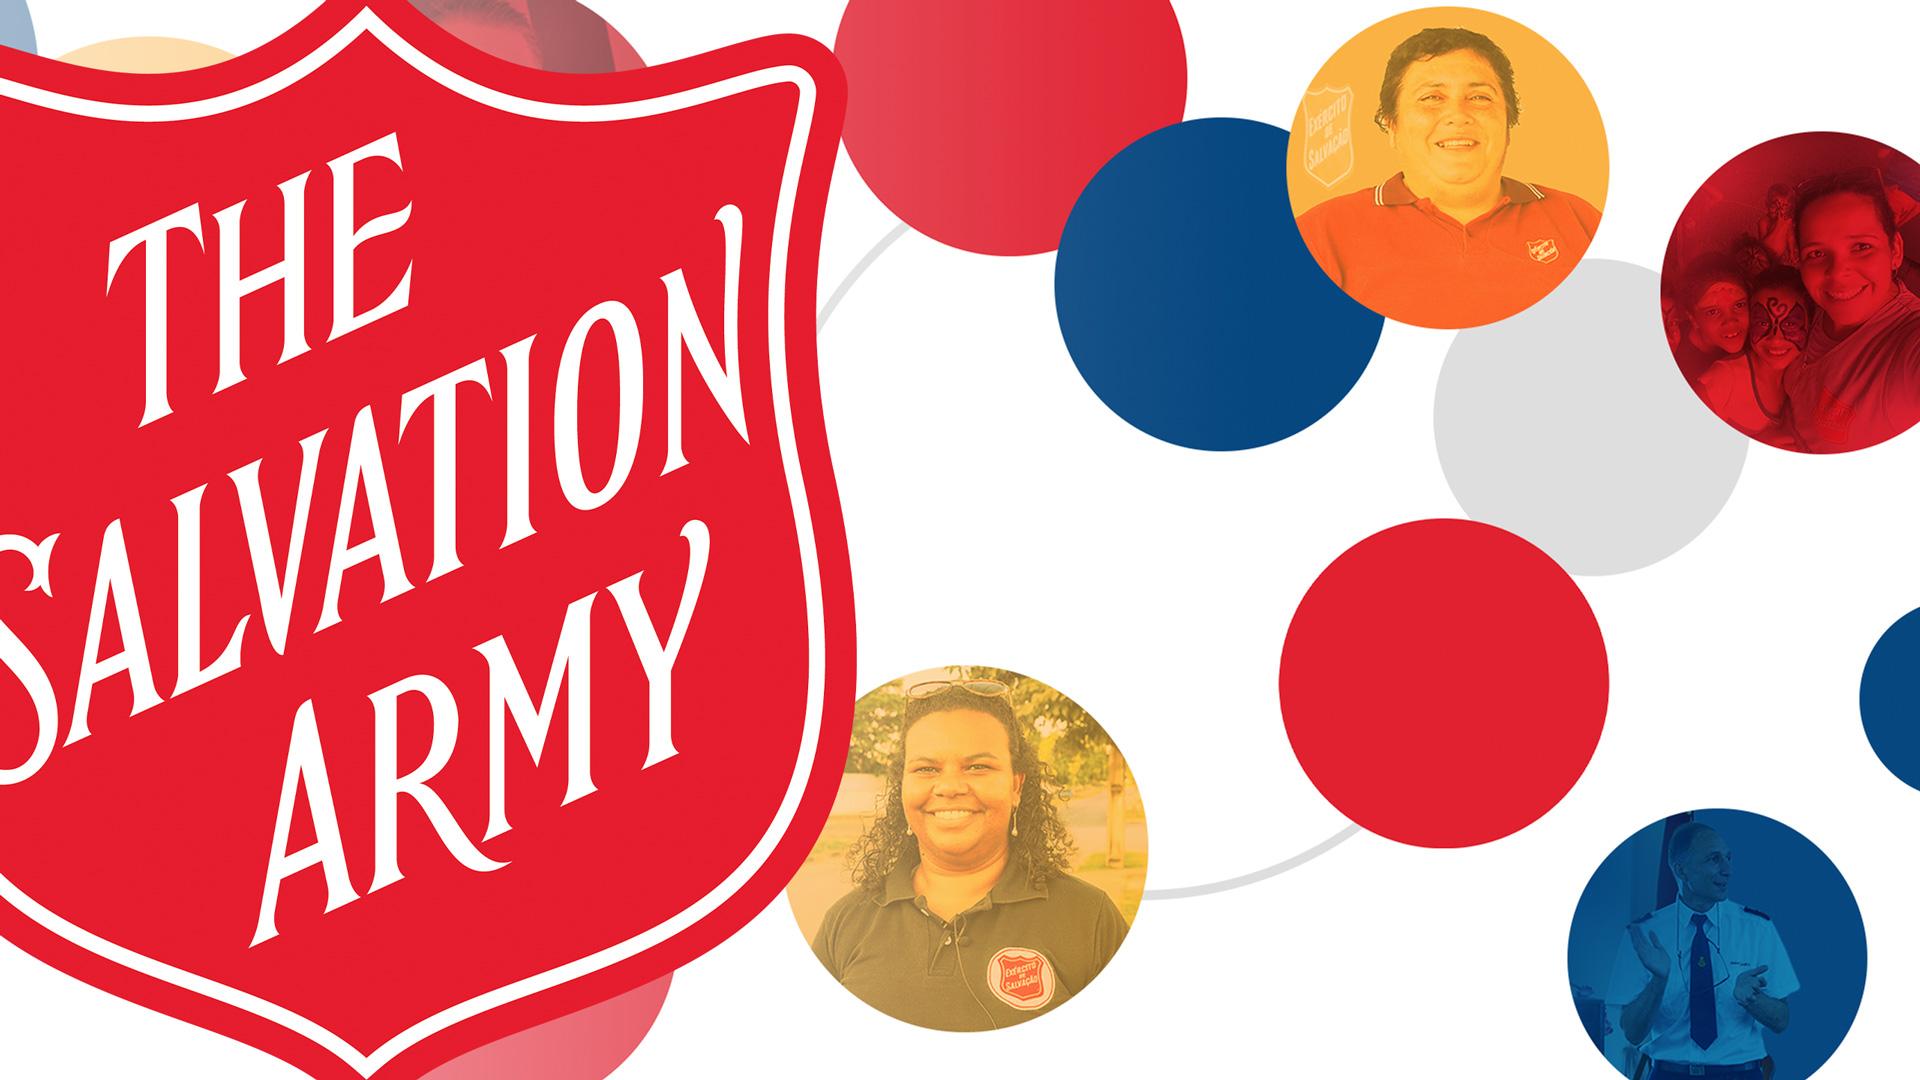 Salvation Army St George logo